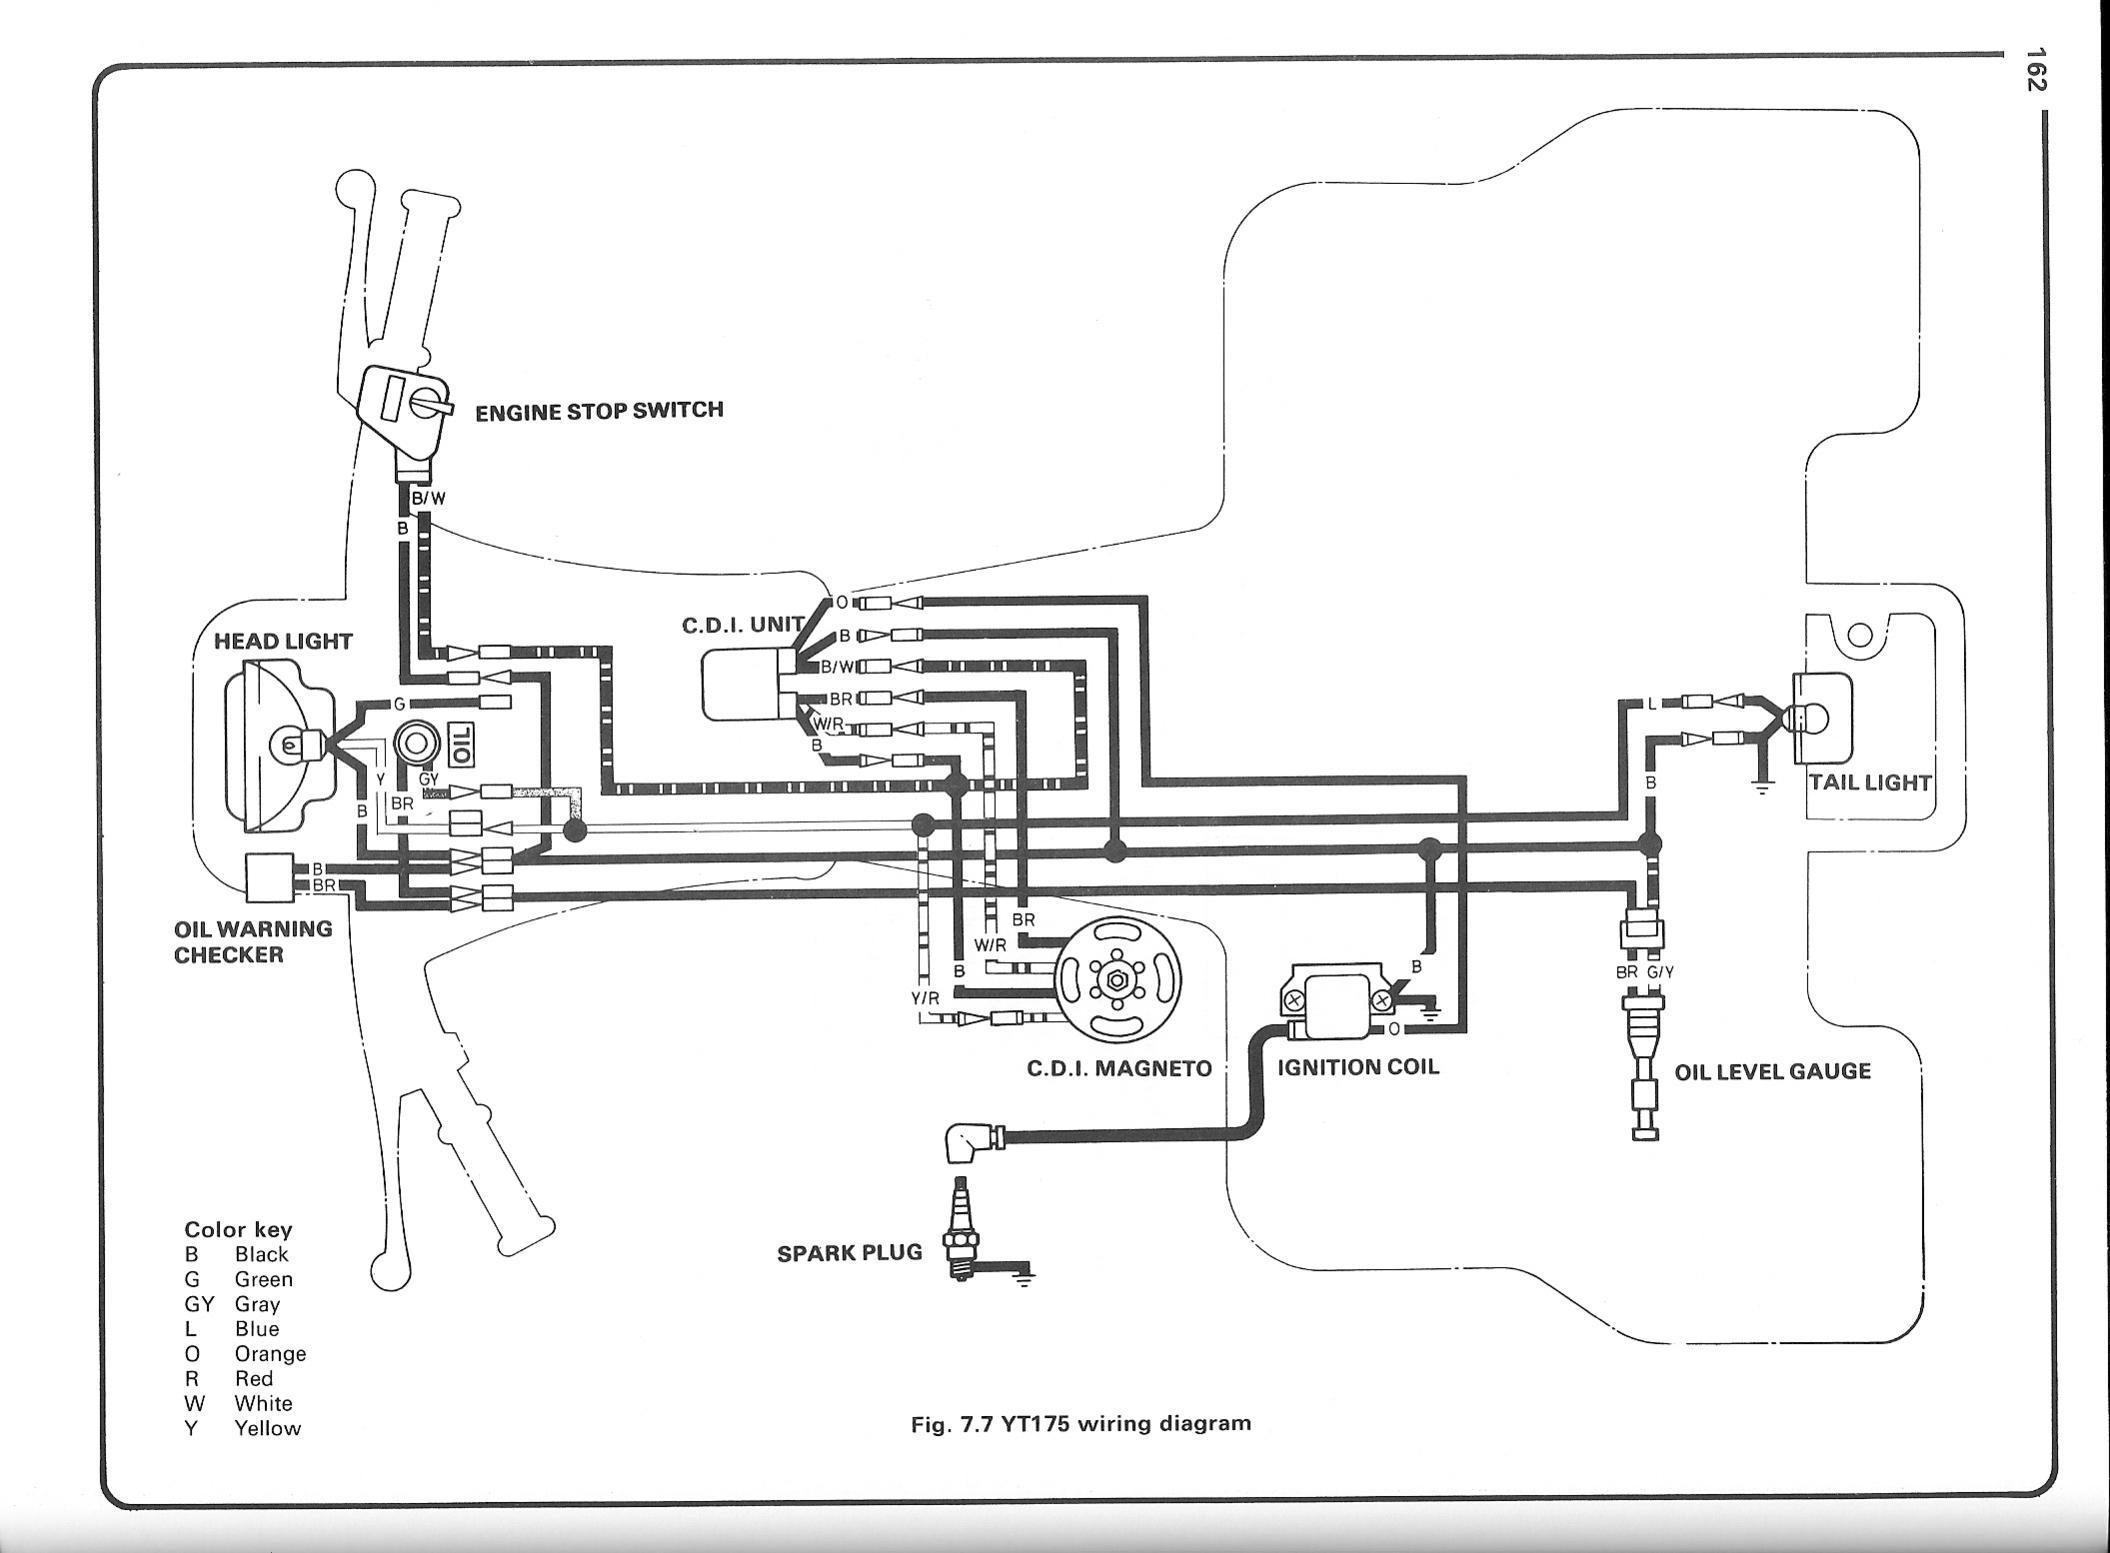 Bmw ccc wiring diagram 5 BMW 328I Radiator Diagram BMW Ignition System Schematic BMW E46 Wiring Harness